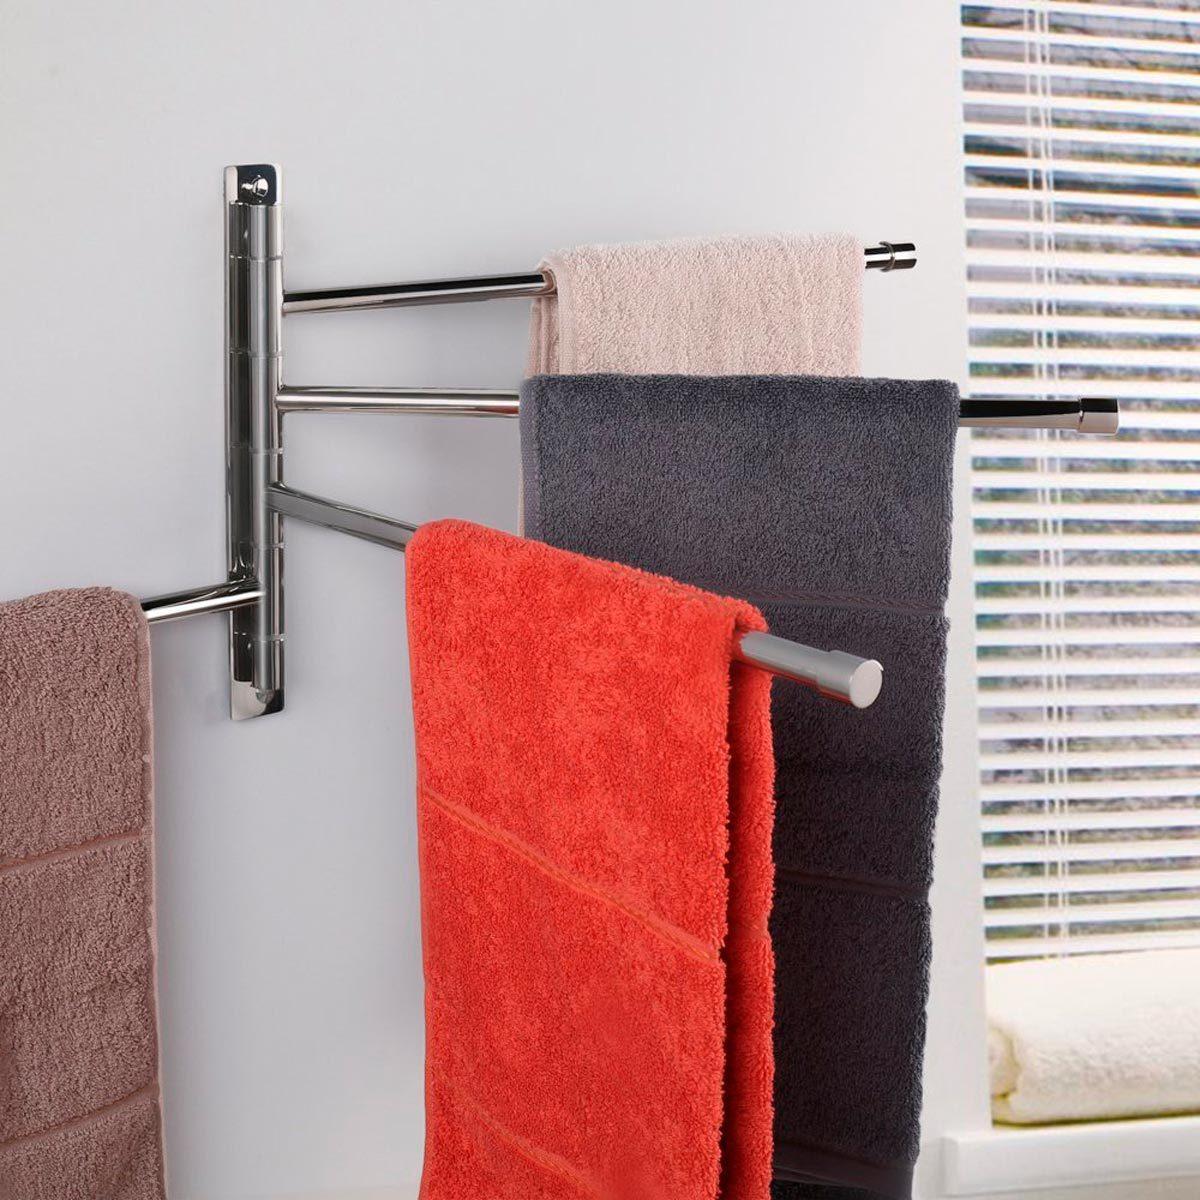 Purchase a Swivel Towel Bar